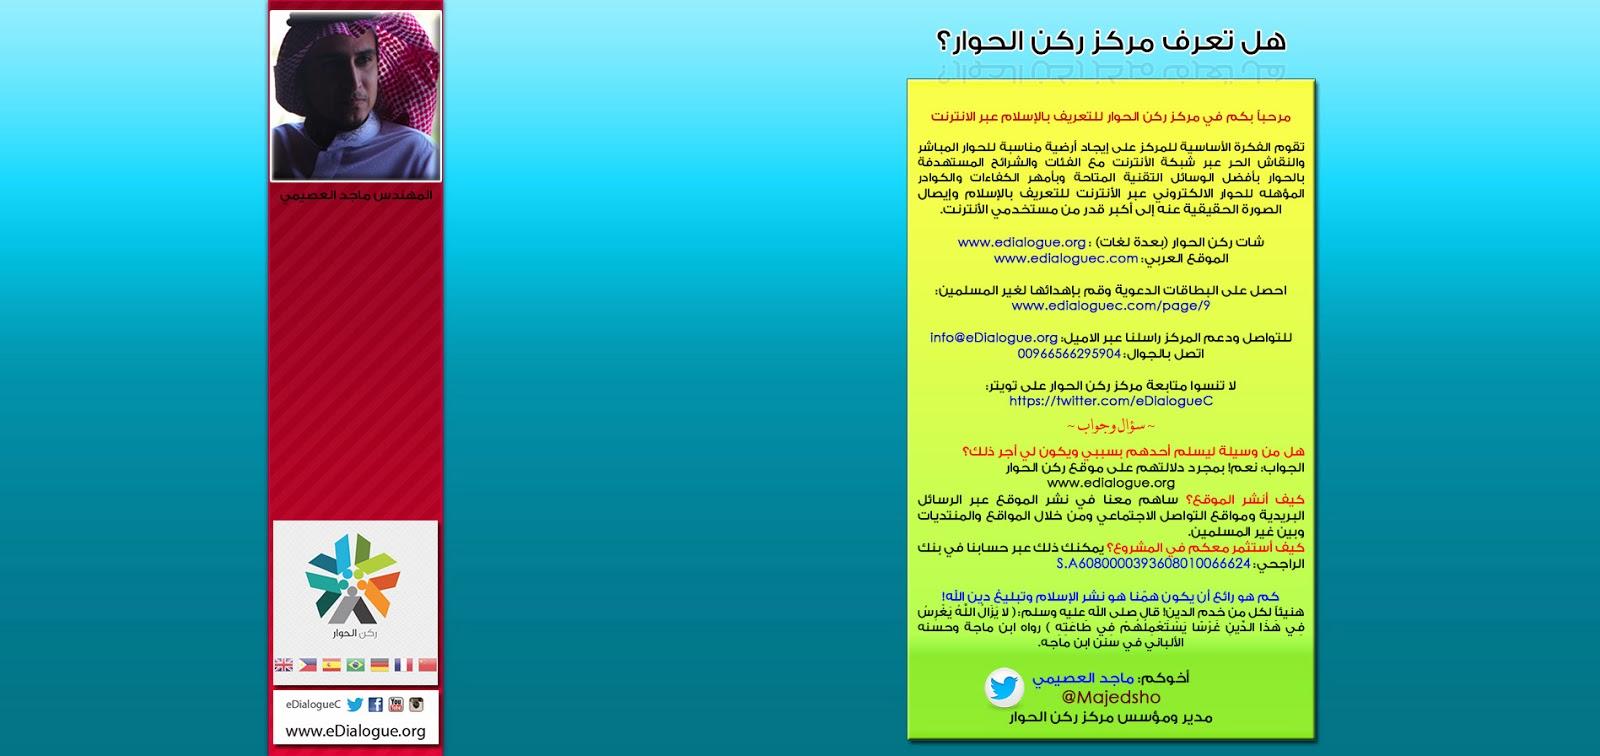 http://4.bp.blogspot.com/-E_z27hGVg6Y/UnC5C6GceNI/AAAAAAAAFaI/GSfC9_IeAA0/s1600/Free_Twitter_Background-7.jpg